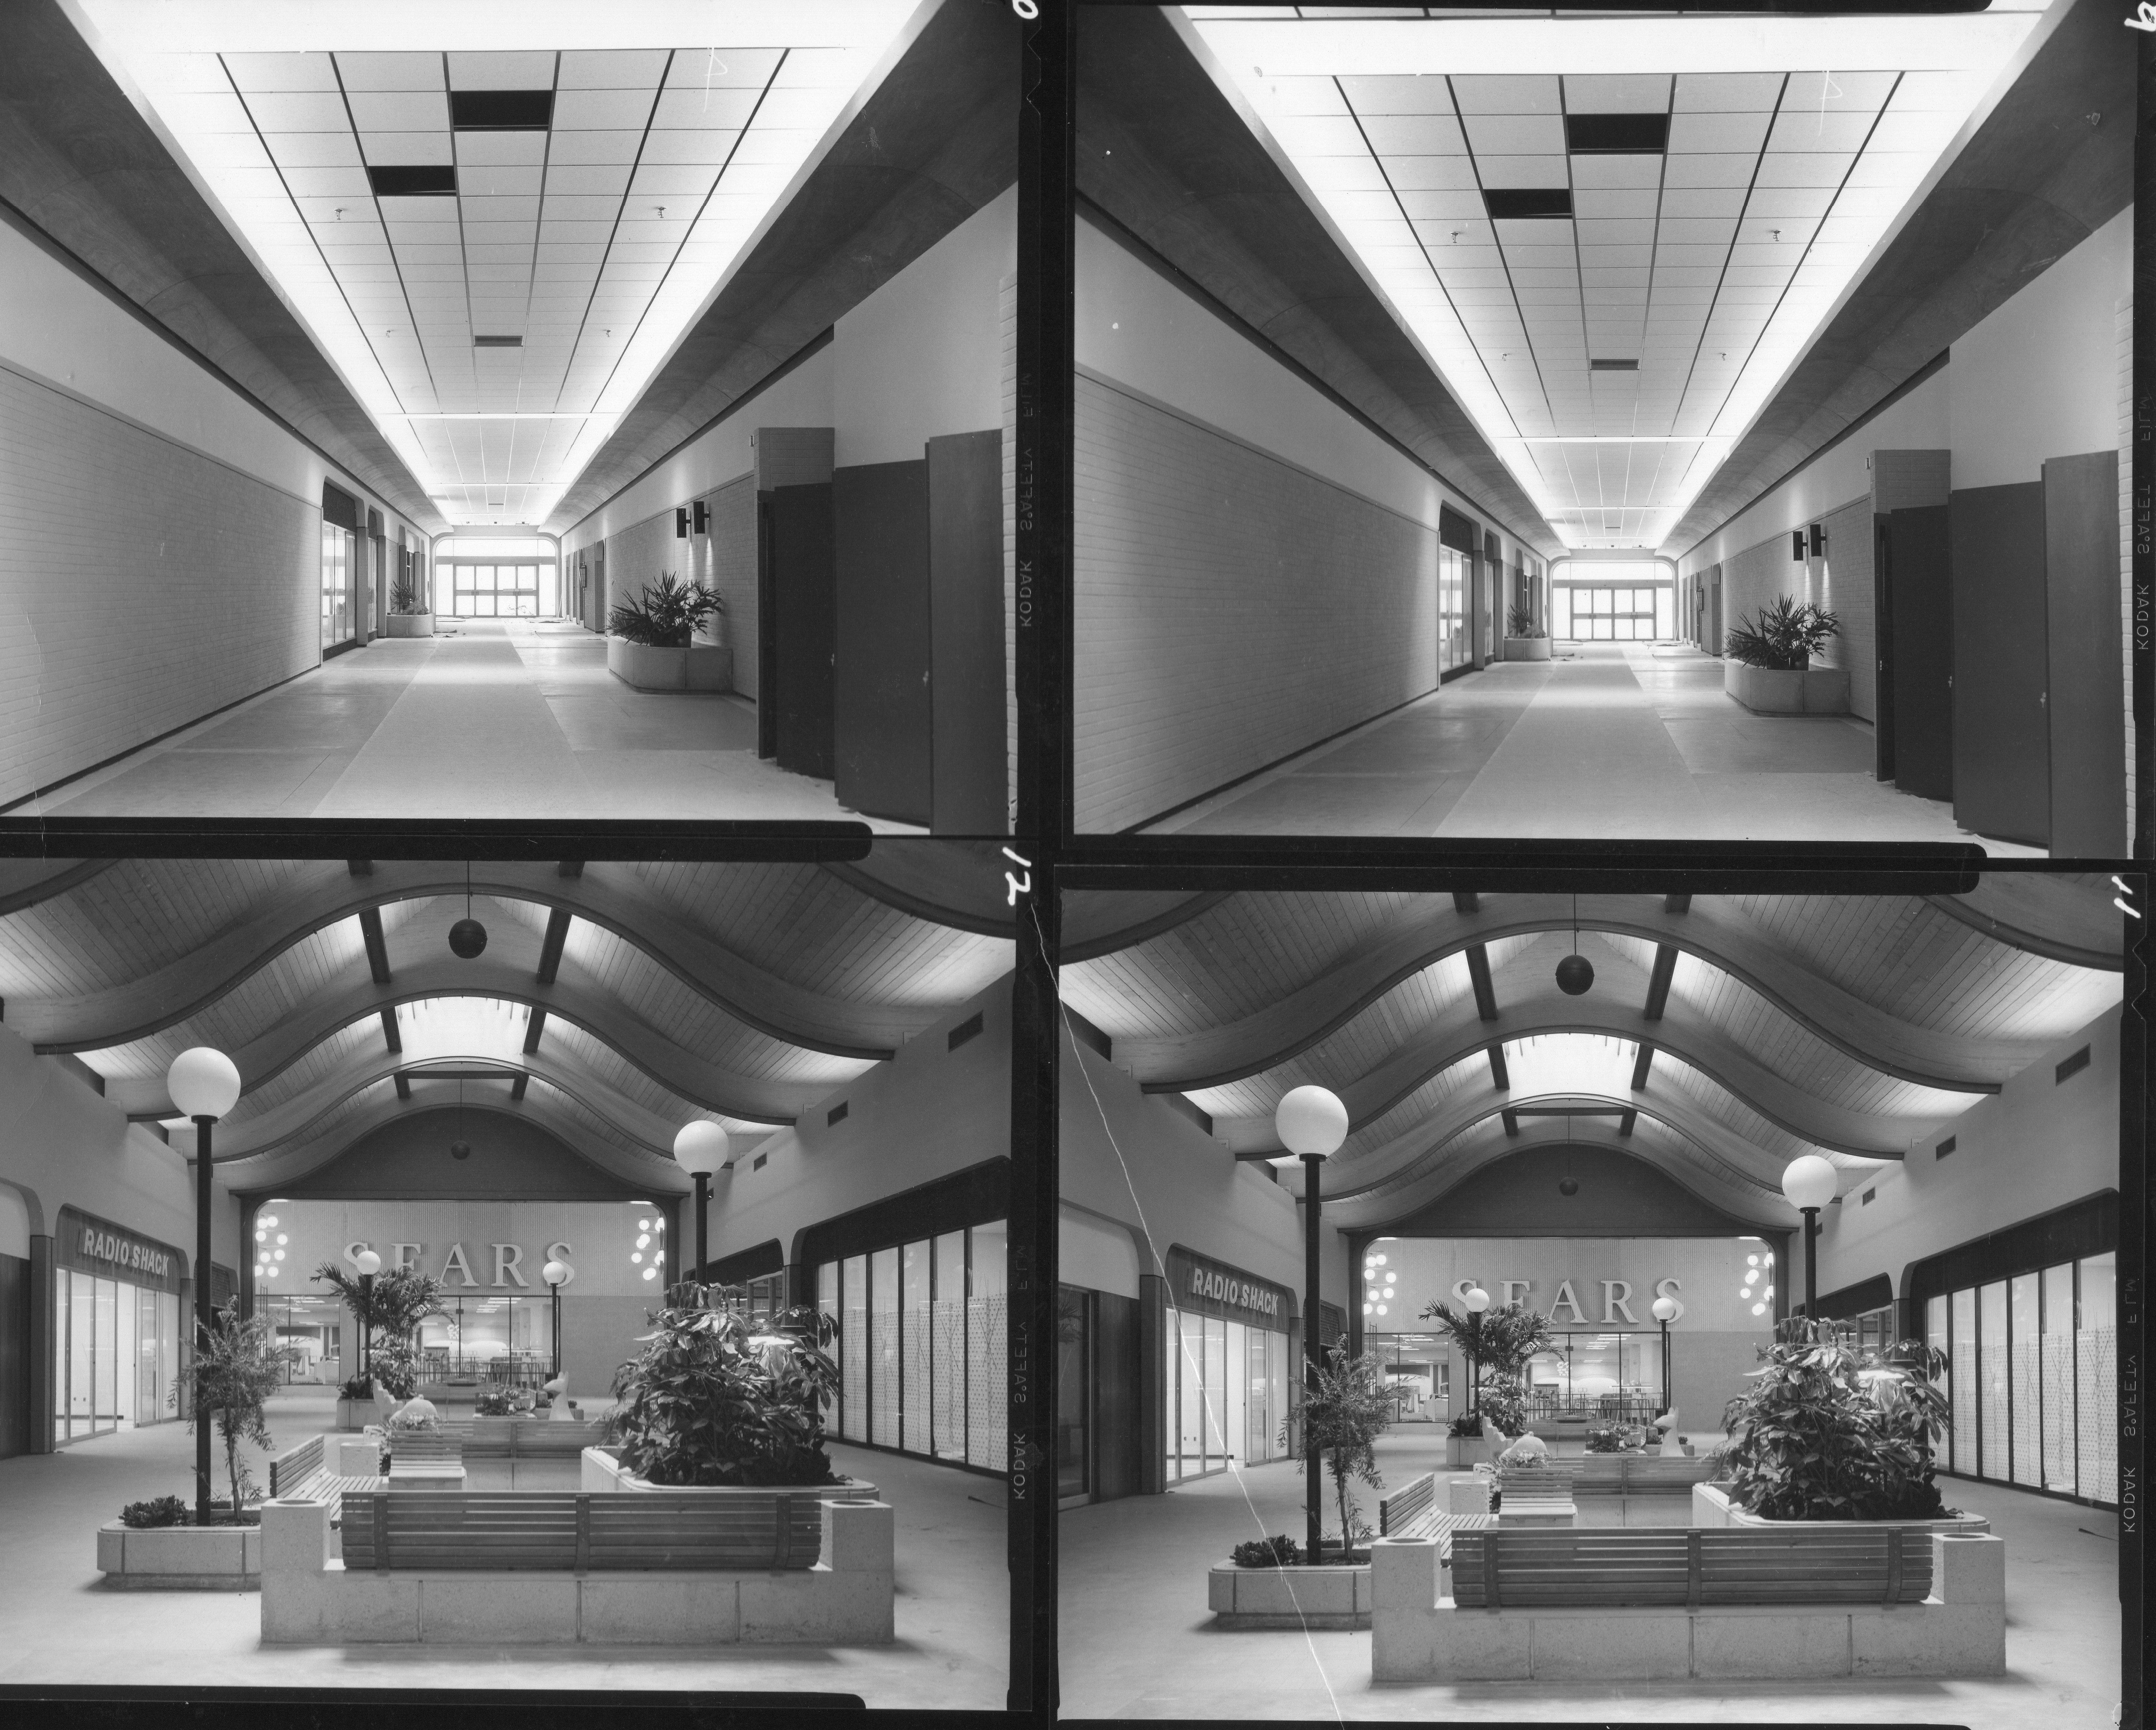 Sears grand opening Burlington, MA